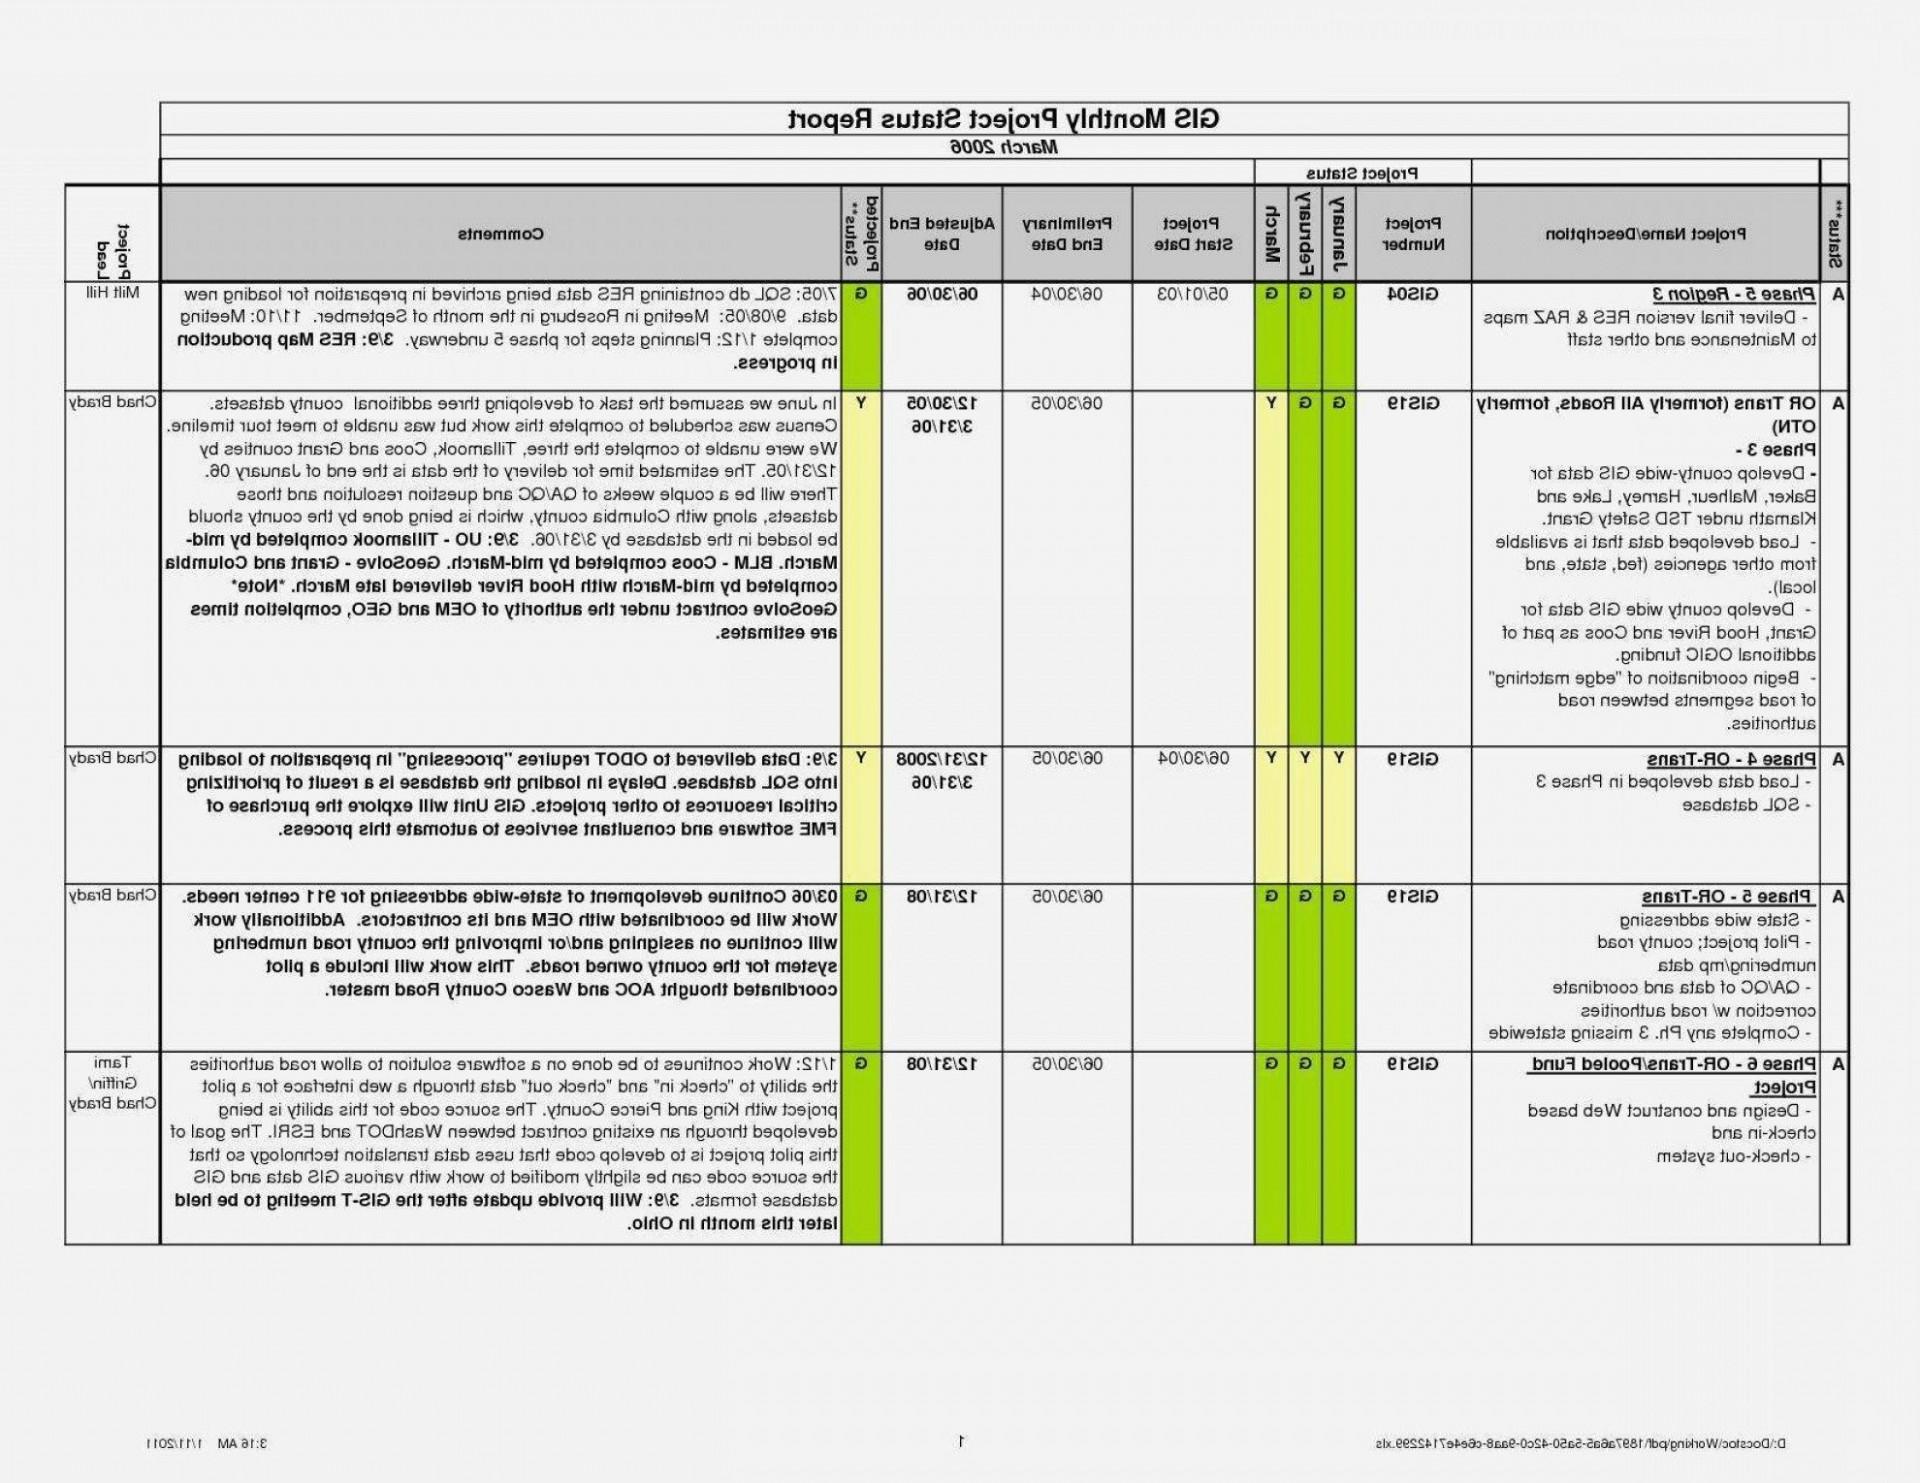 002 Impressive Project Management Progres Report Template Excel High Resolution  Statu1920